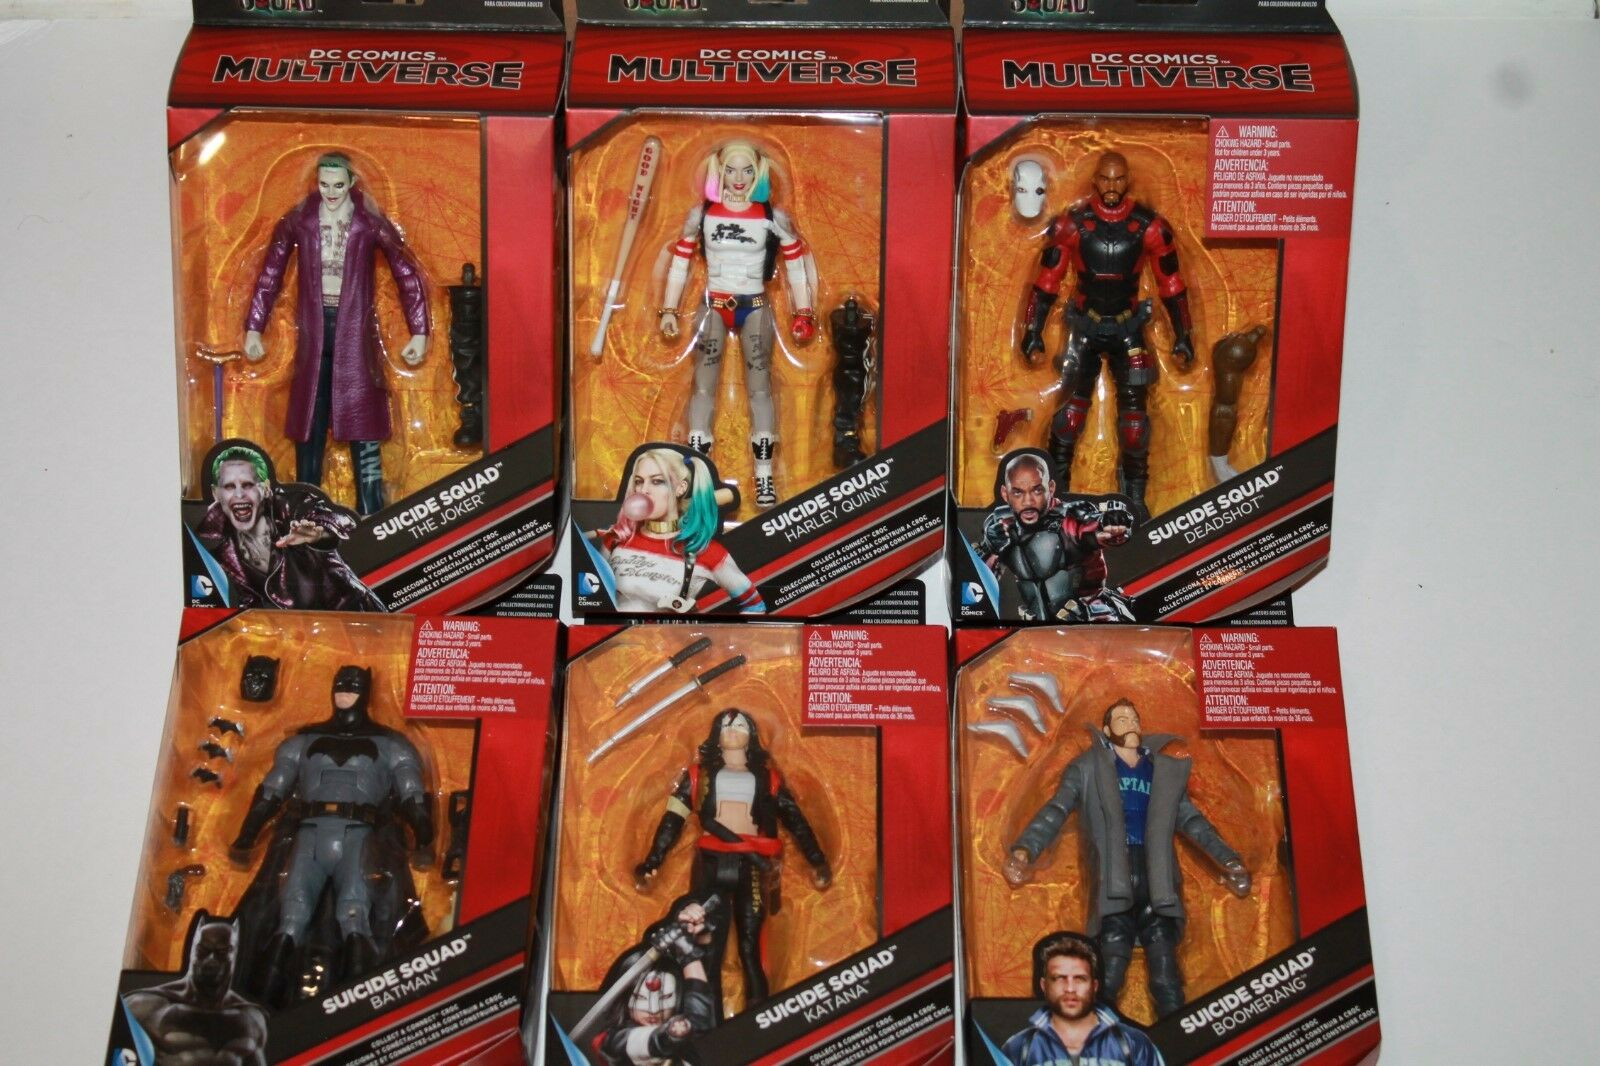 D. c comics multiversum suicide squad hat 6 zahlen meisten harley, joker batman